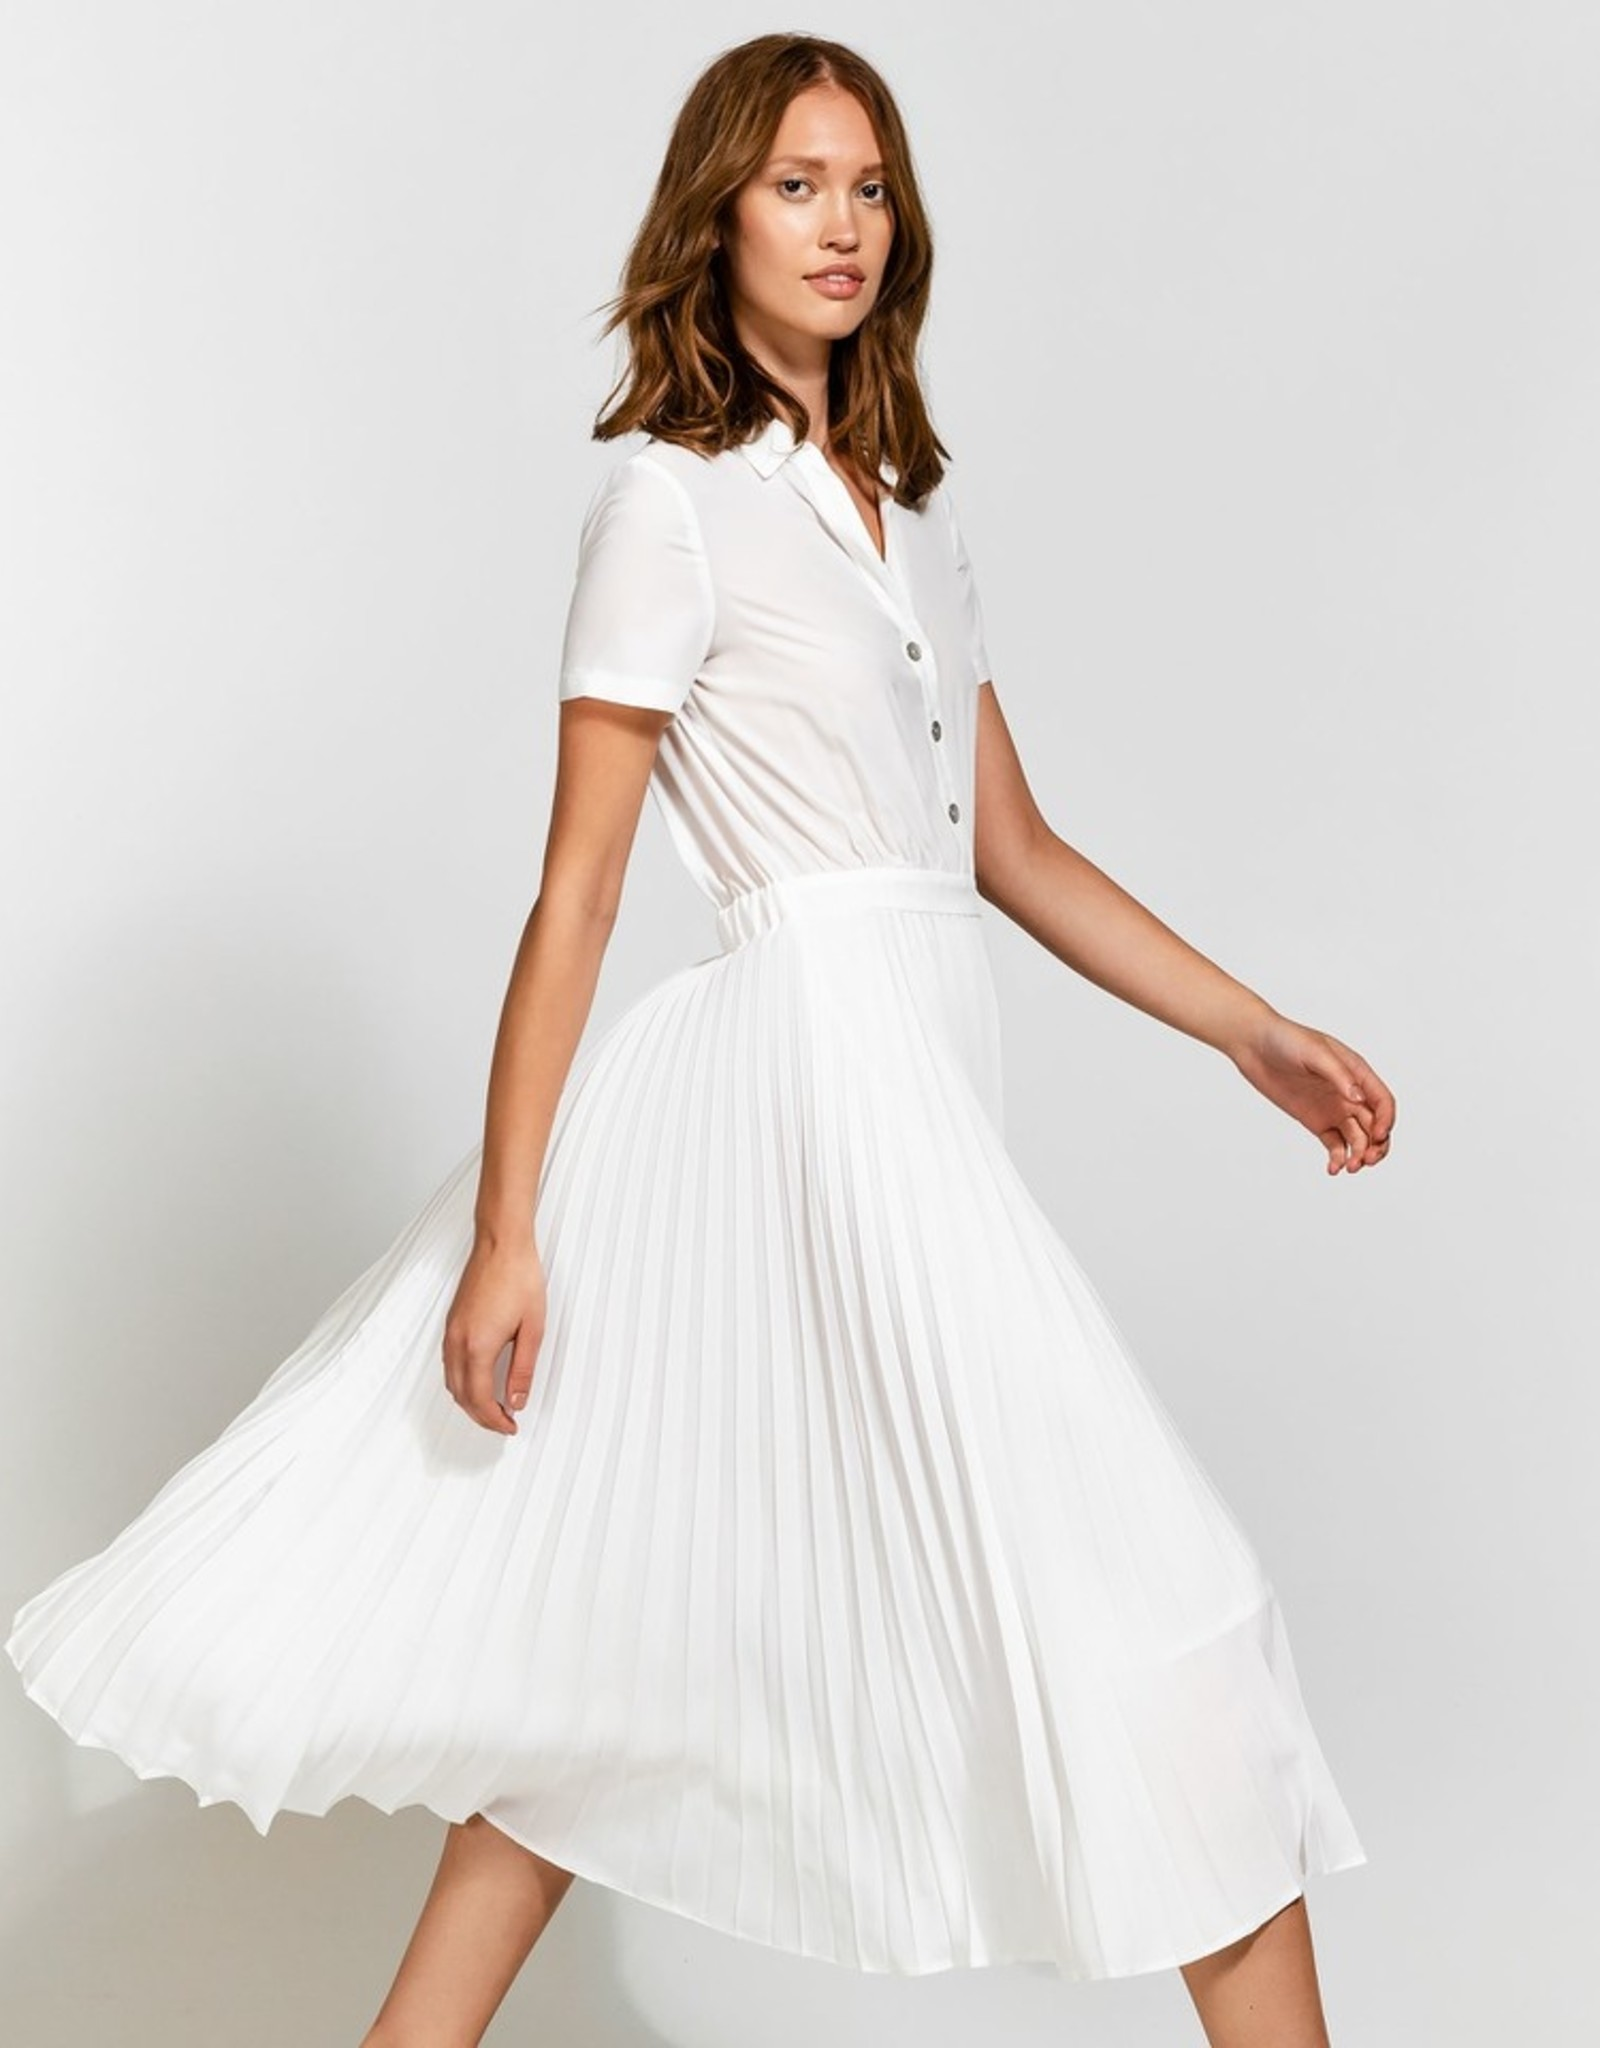 Dames Fashion Witte jurk